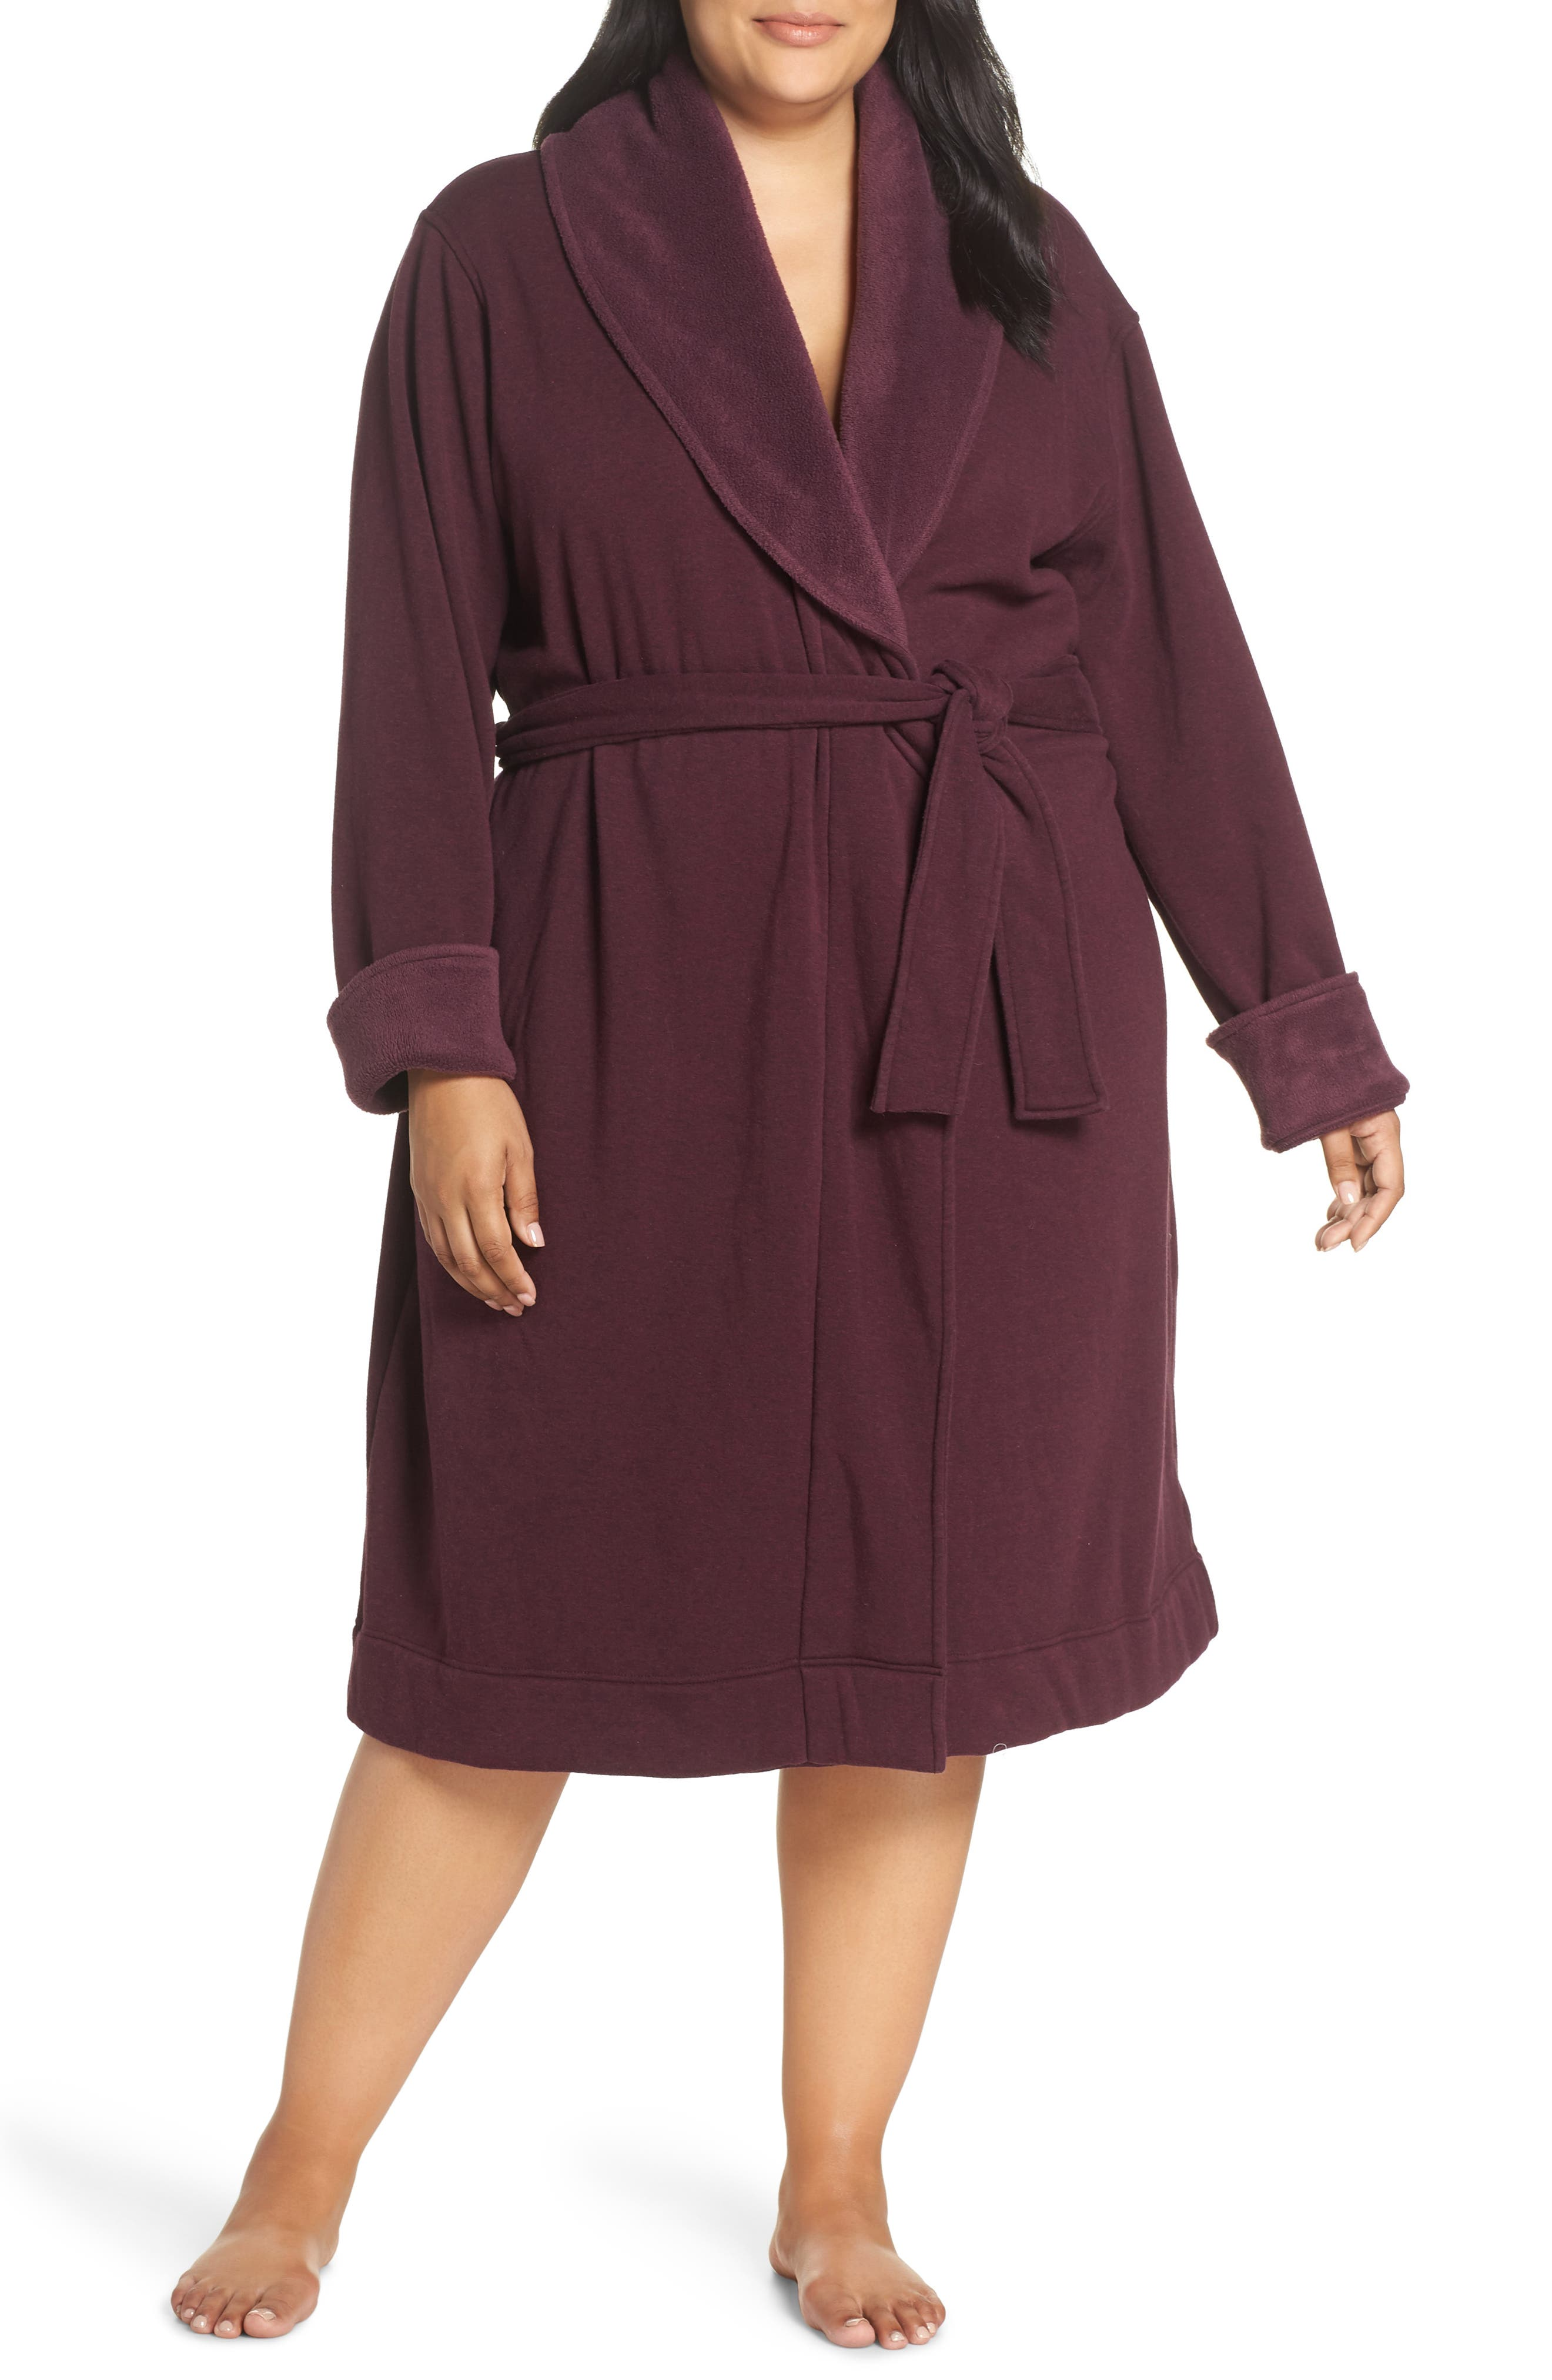 Duffield II Robe,                         Main,                         color, PORT HEATHER